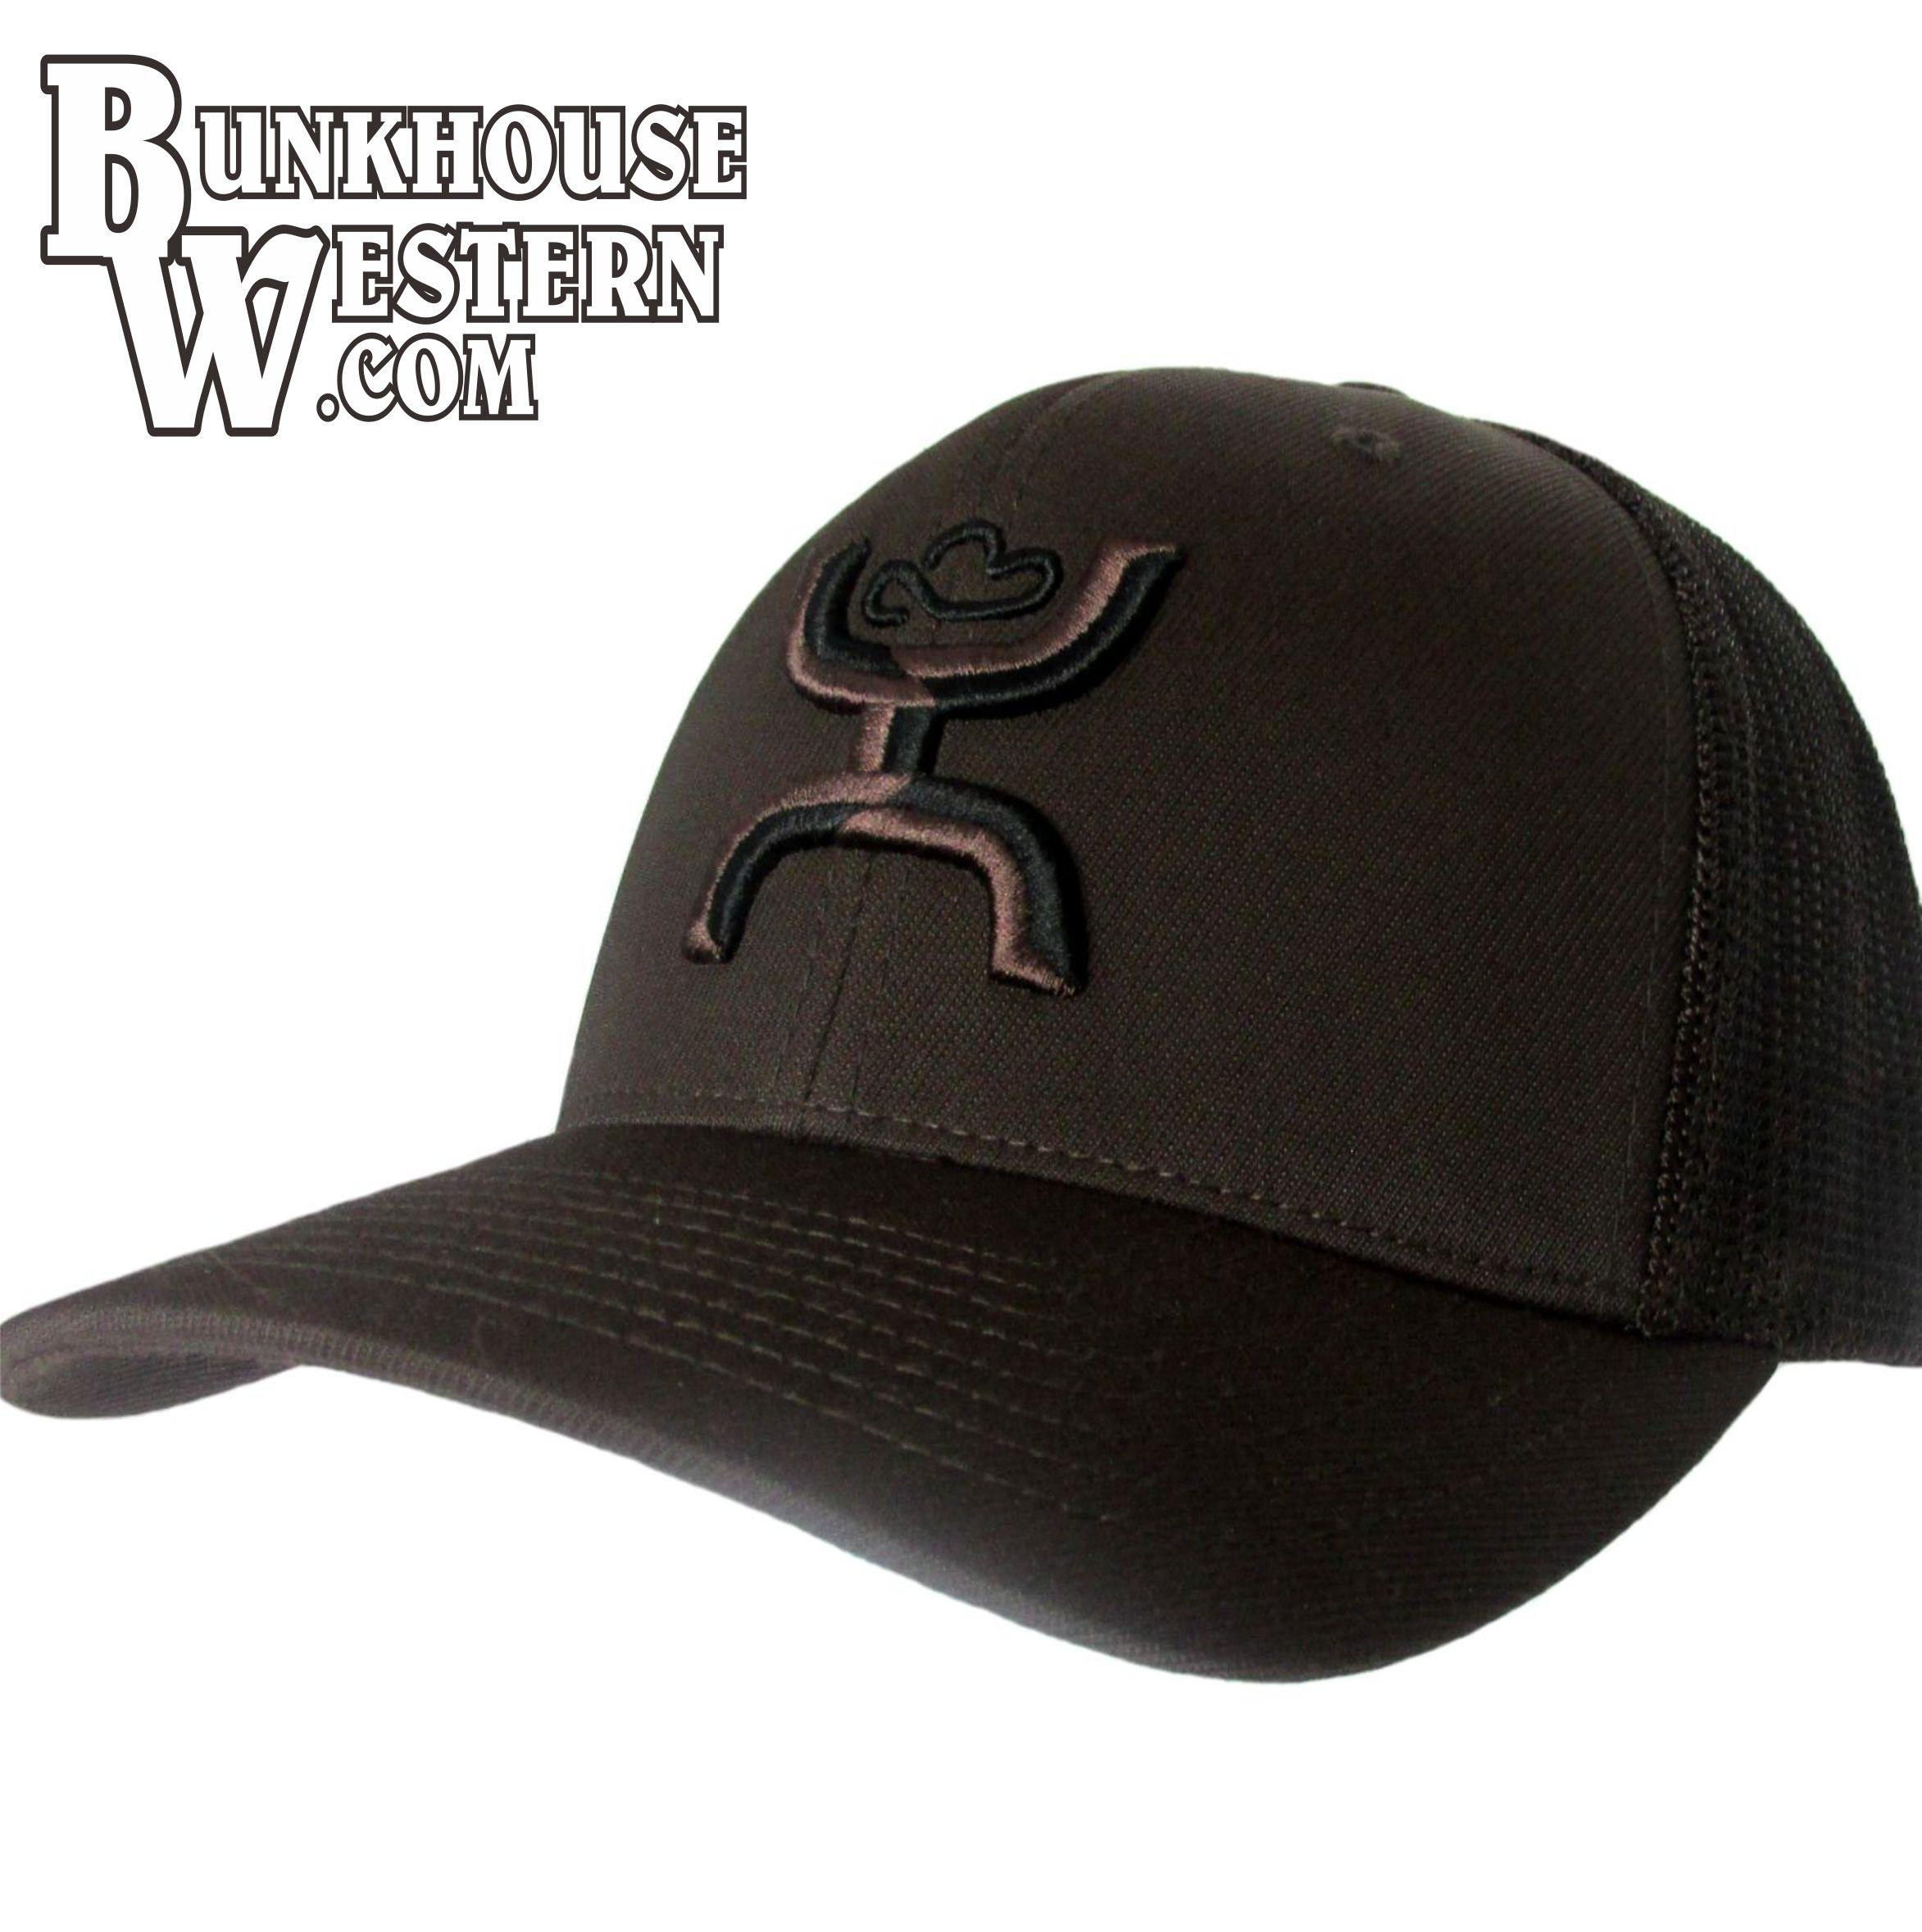 d5b897613 Pin by BunkhouseWestern.Com on HOOey   Baseball hats, Cowboy hats, Hats